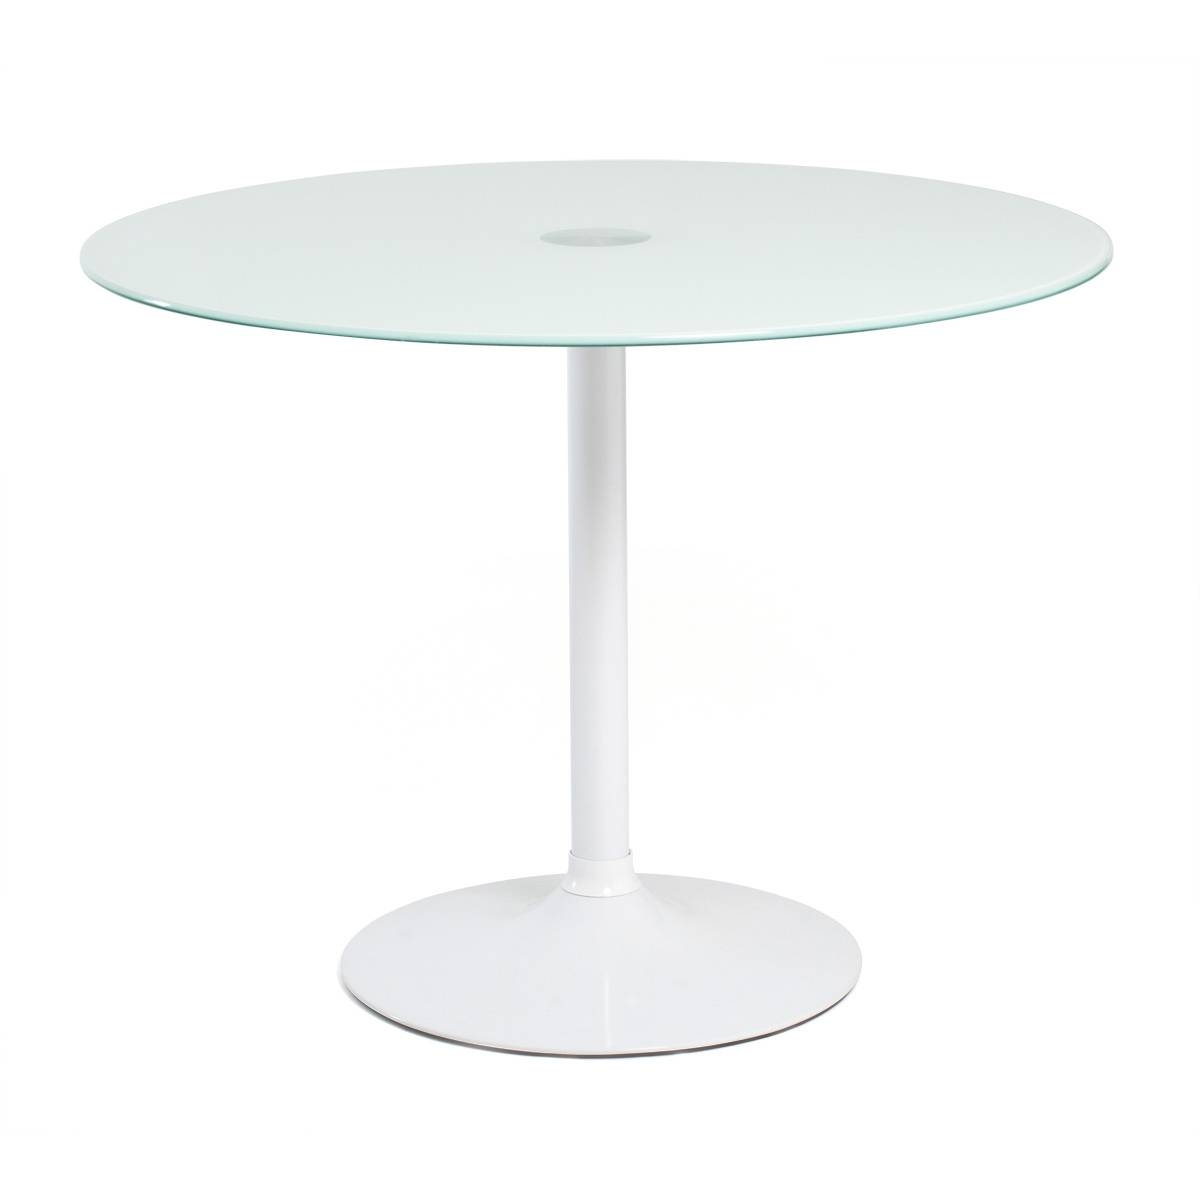 Aeon Furniture, Aeon Furniture, Elena Round Glass Dining Table in Elena Coffee Tables (Image 2 of 30)